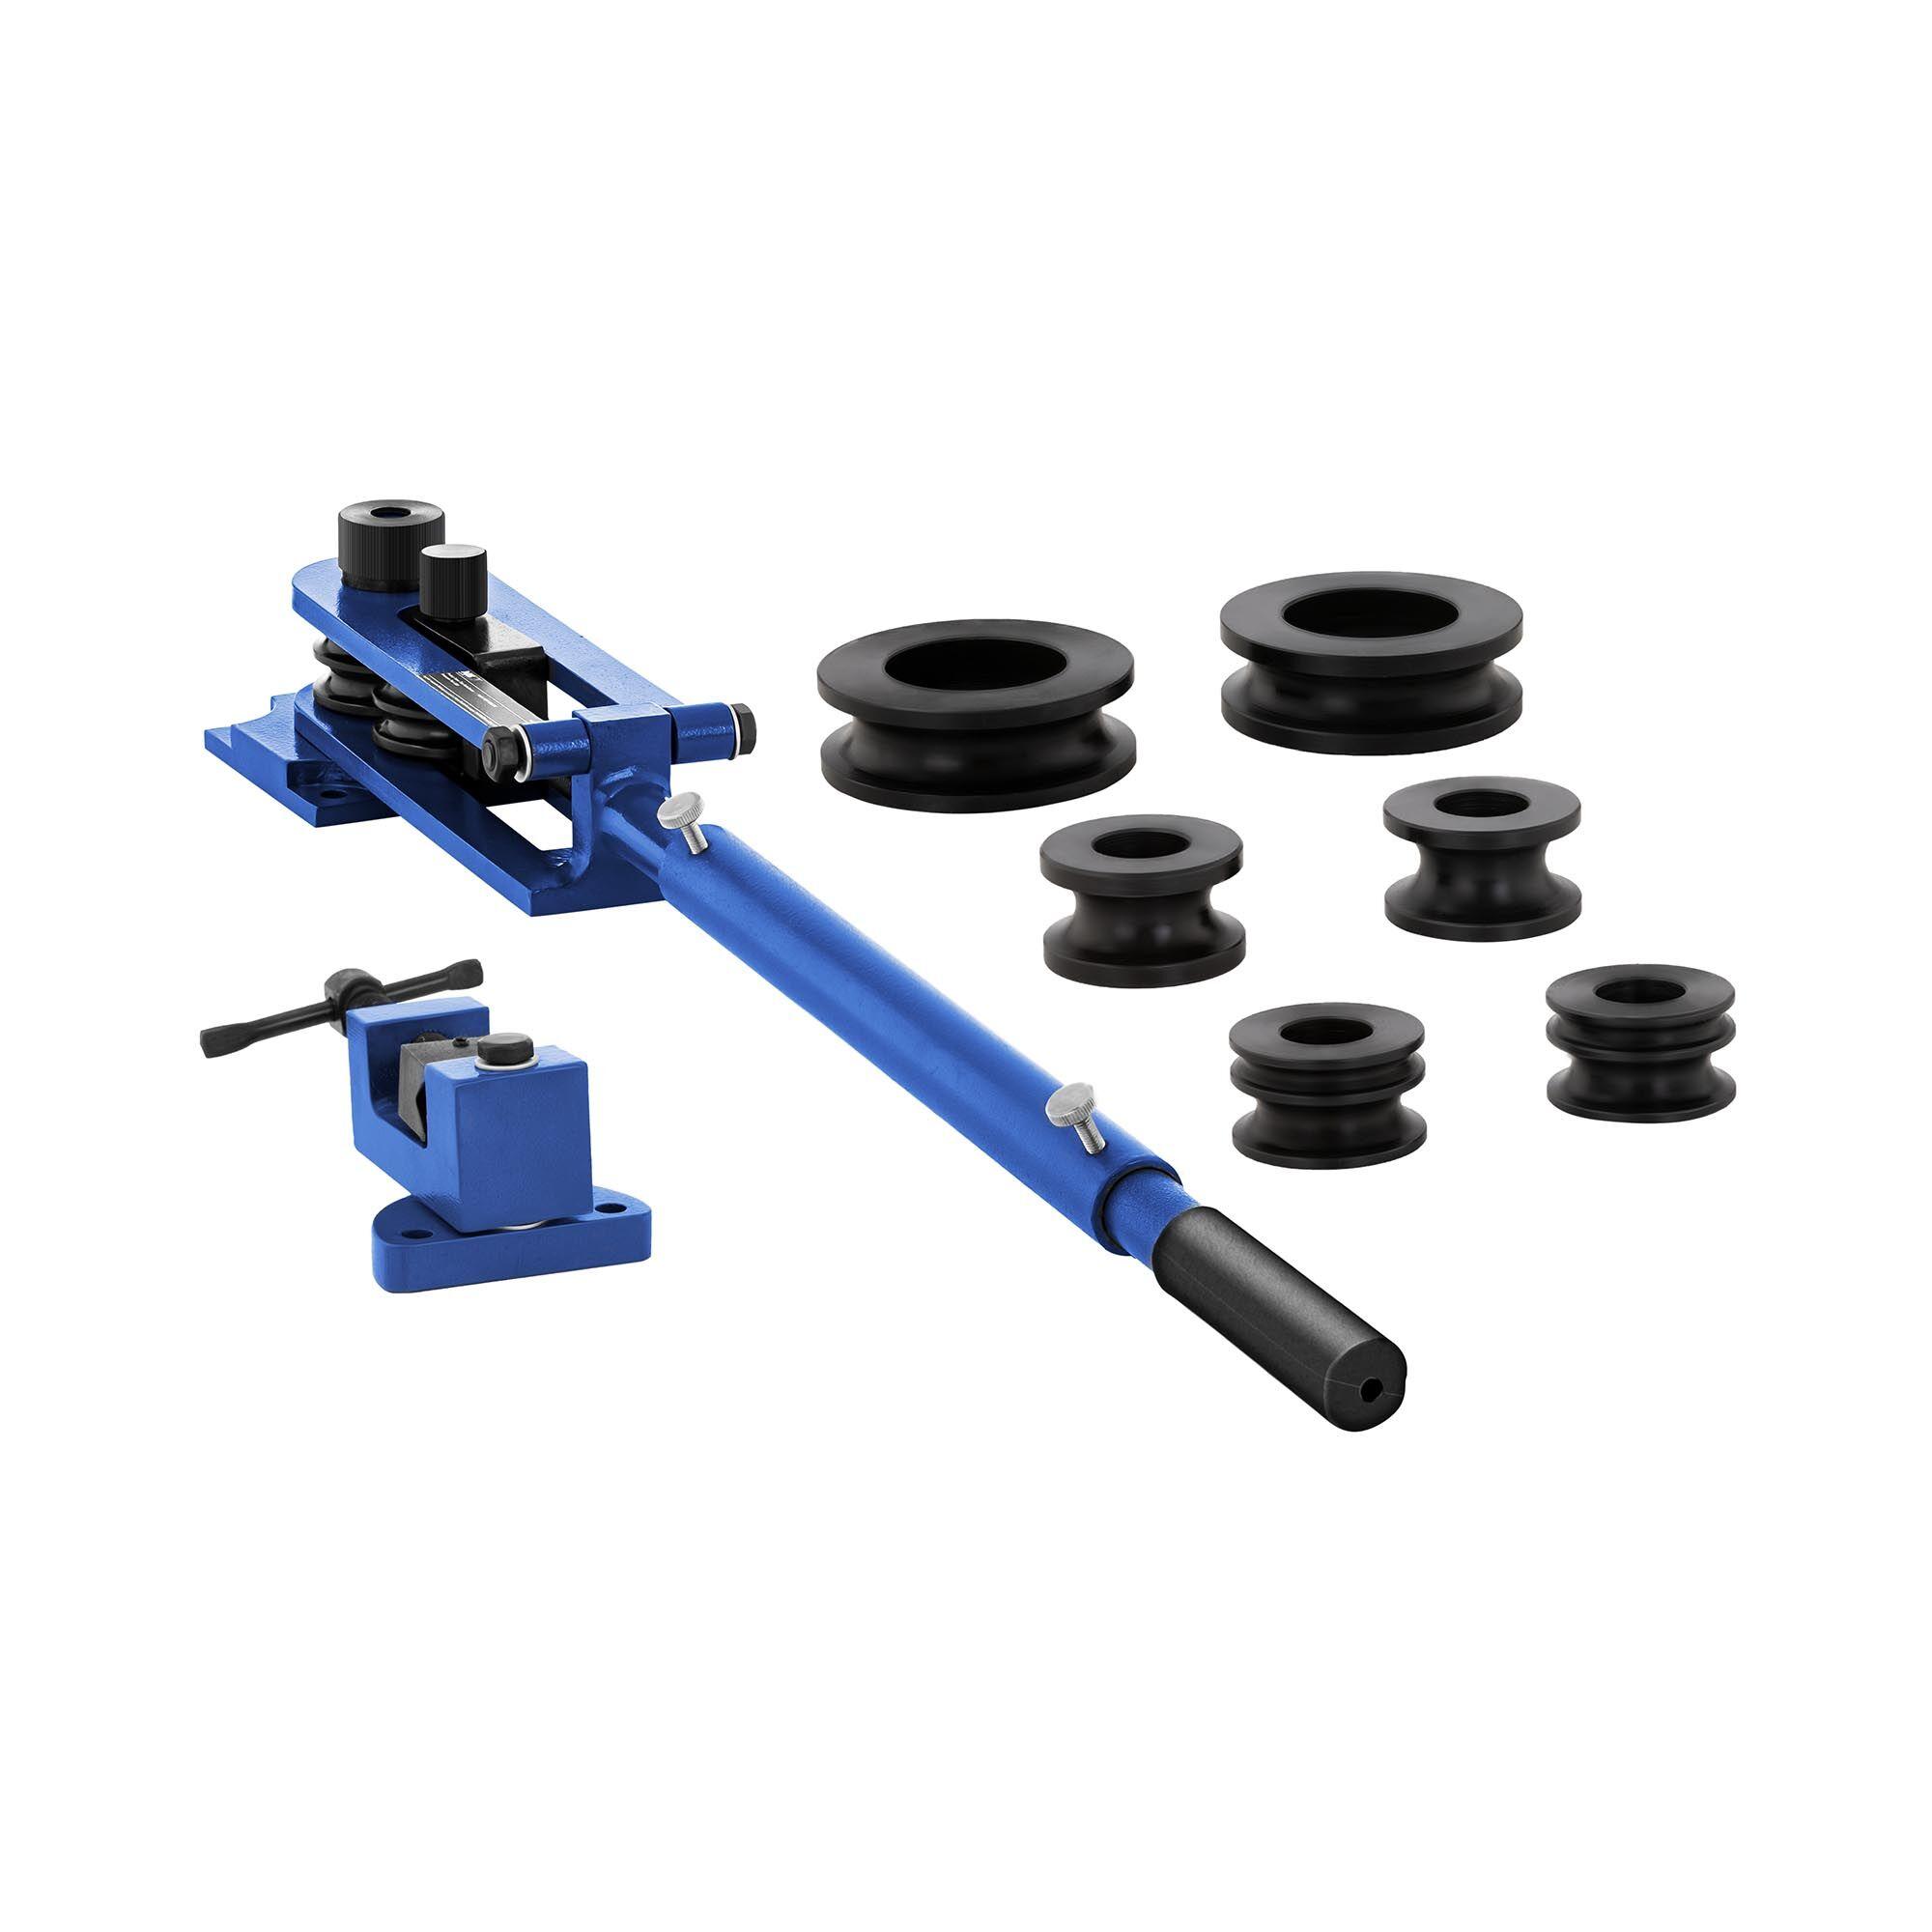 msw piegatubi manuale - Ø 9,5 - 22,2 mm - fino a 360° -trb-200